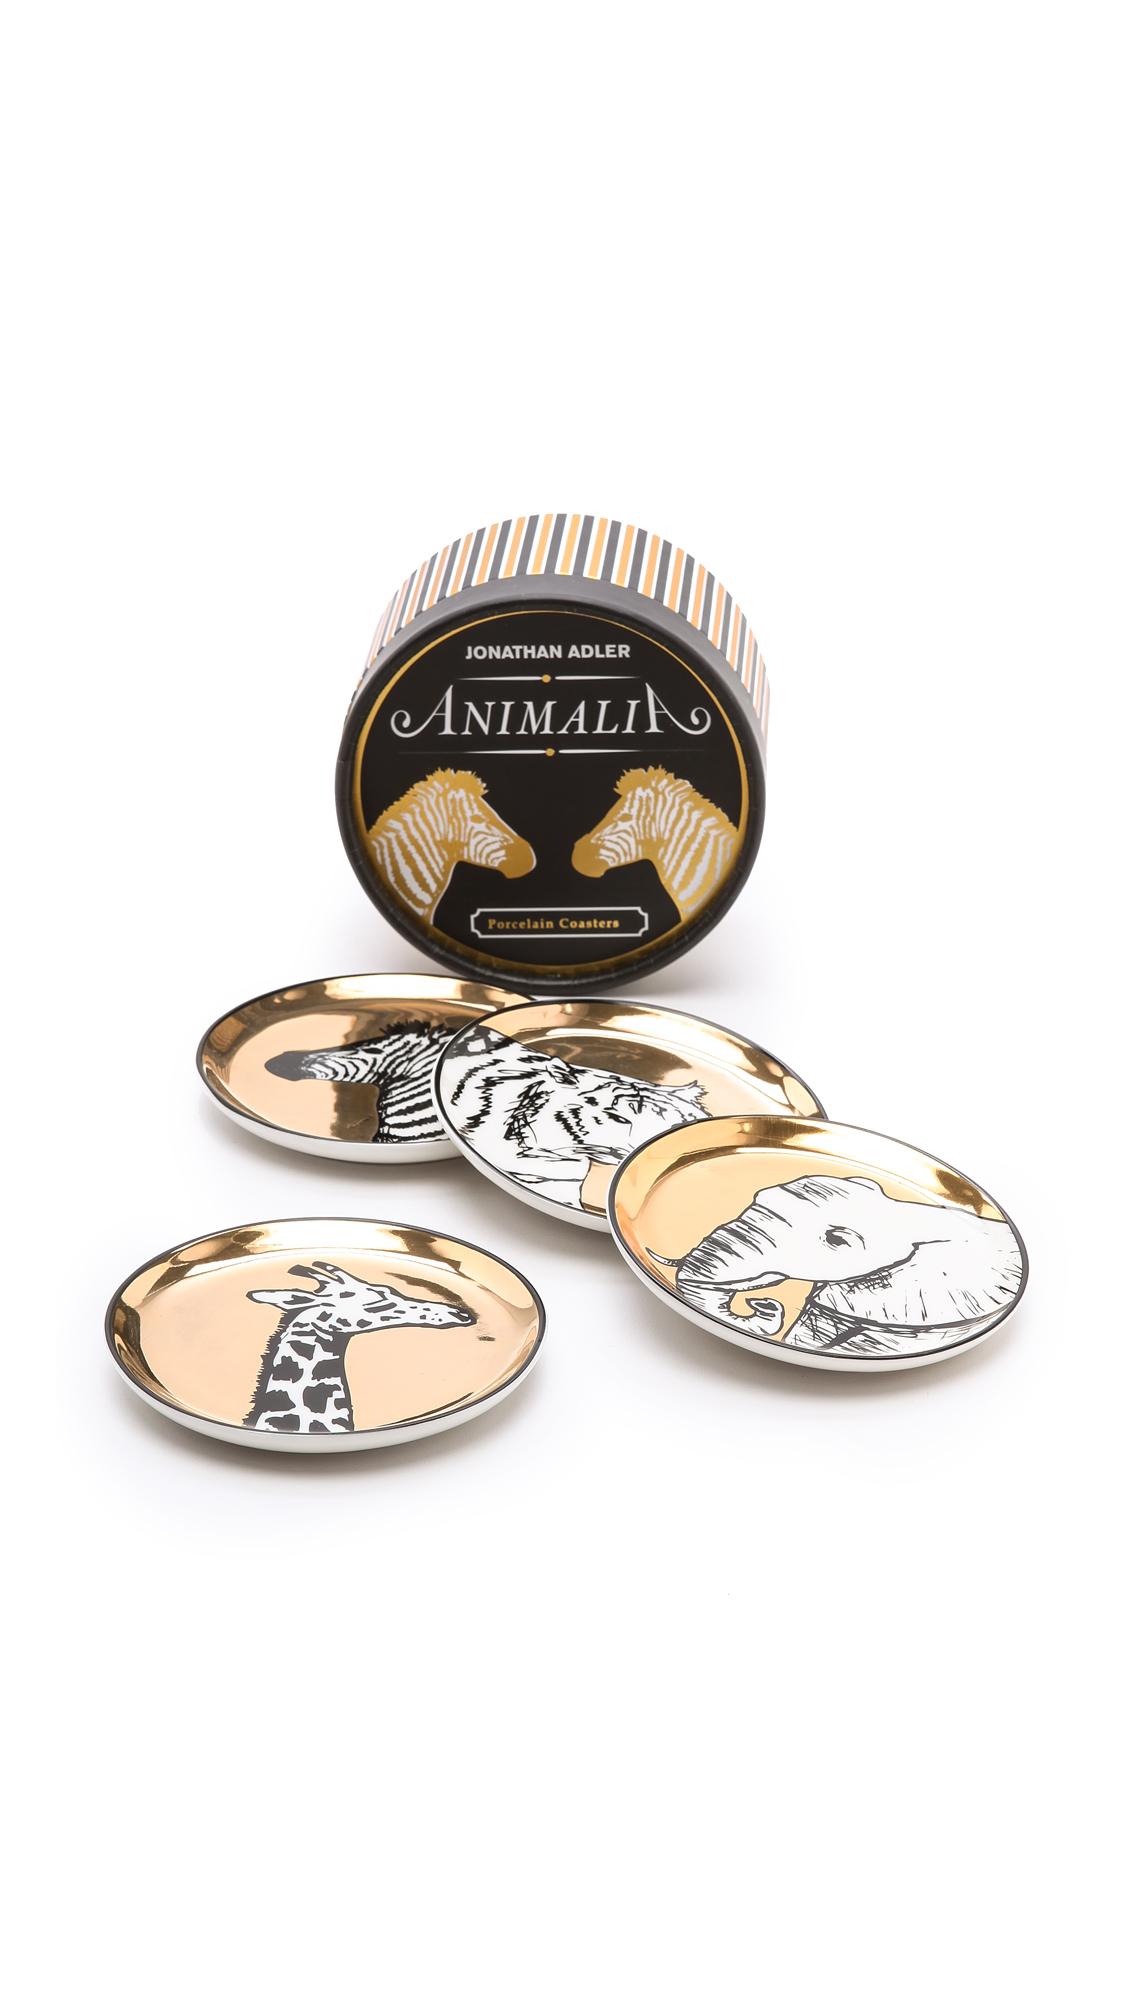 Jonathan Adler Animalia Coaster Set - Gold Multi